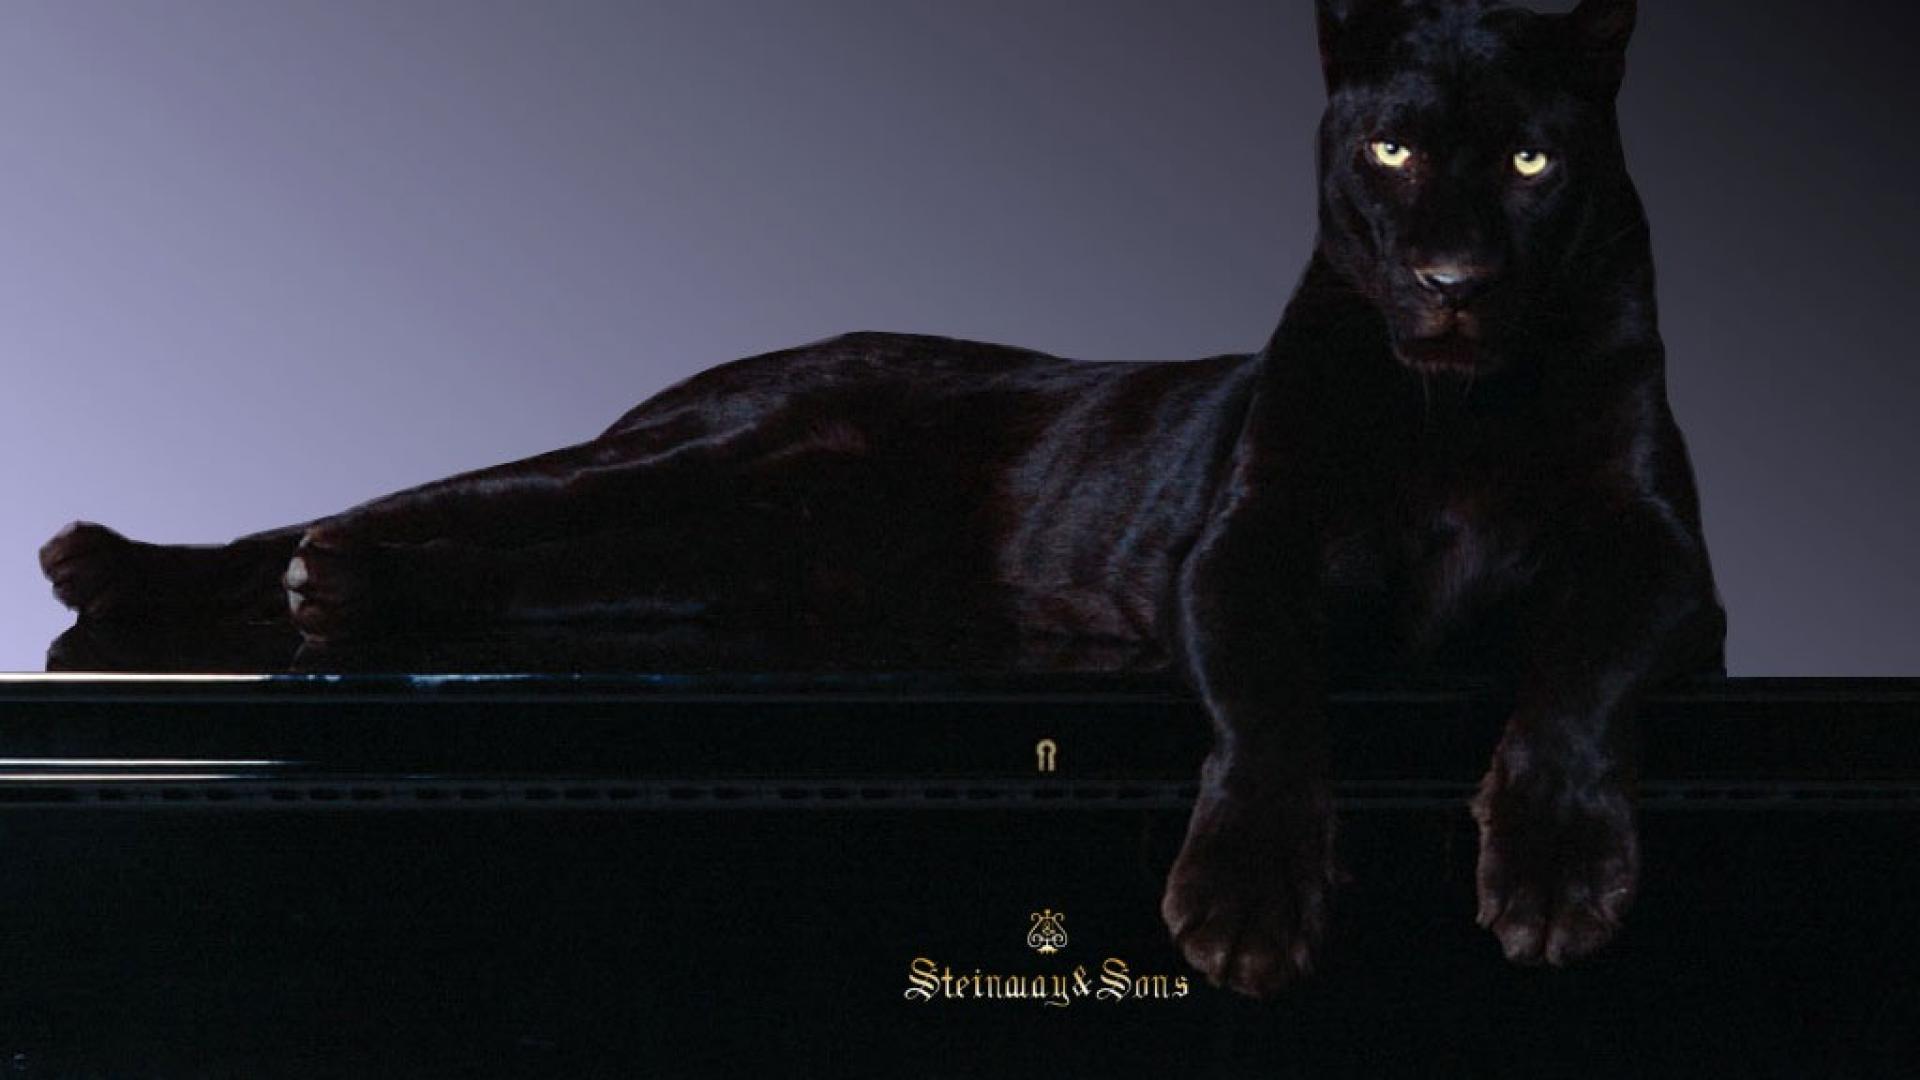 Black Panther wallpaper 1920x1080 45761 1920x1080